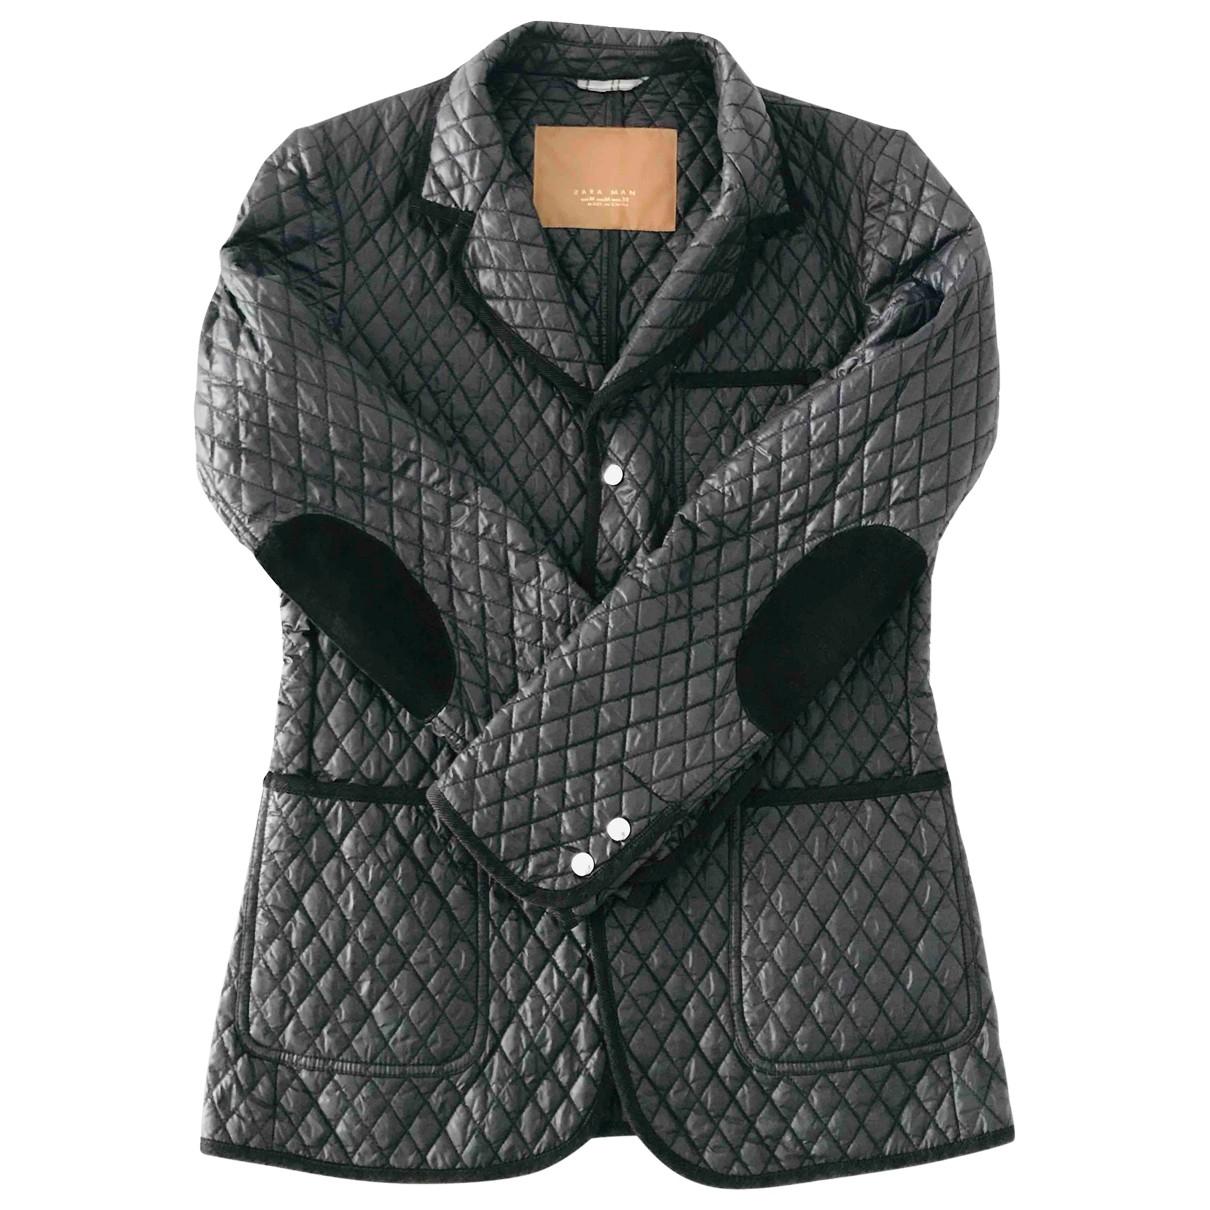 Zara \N Black jacket  for Men M International